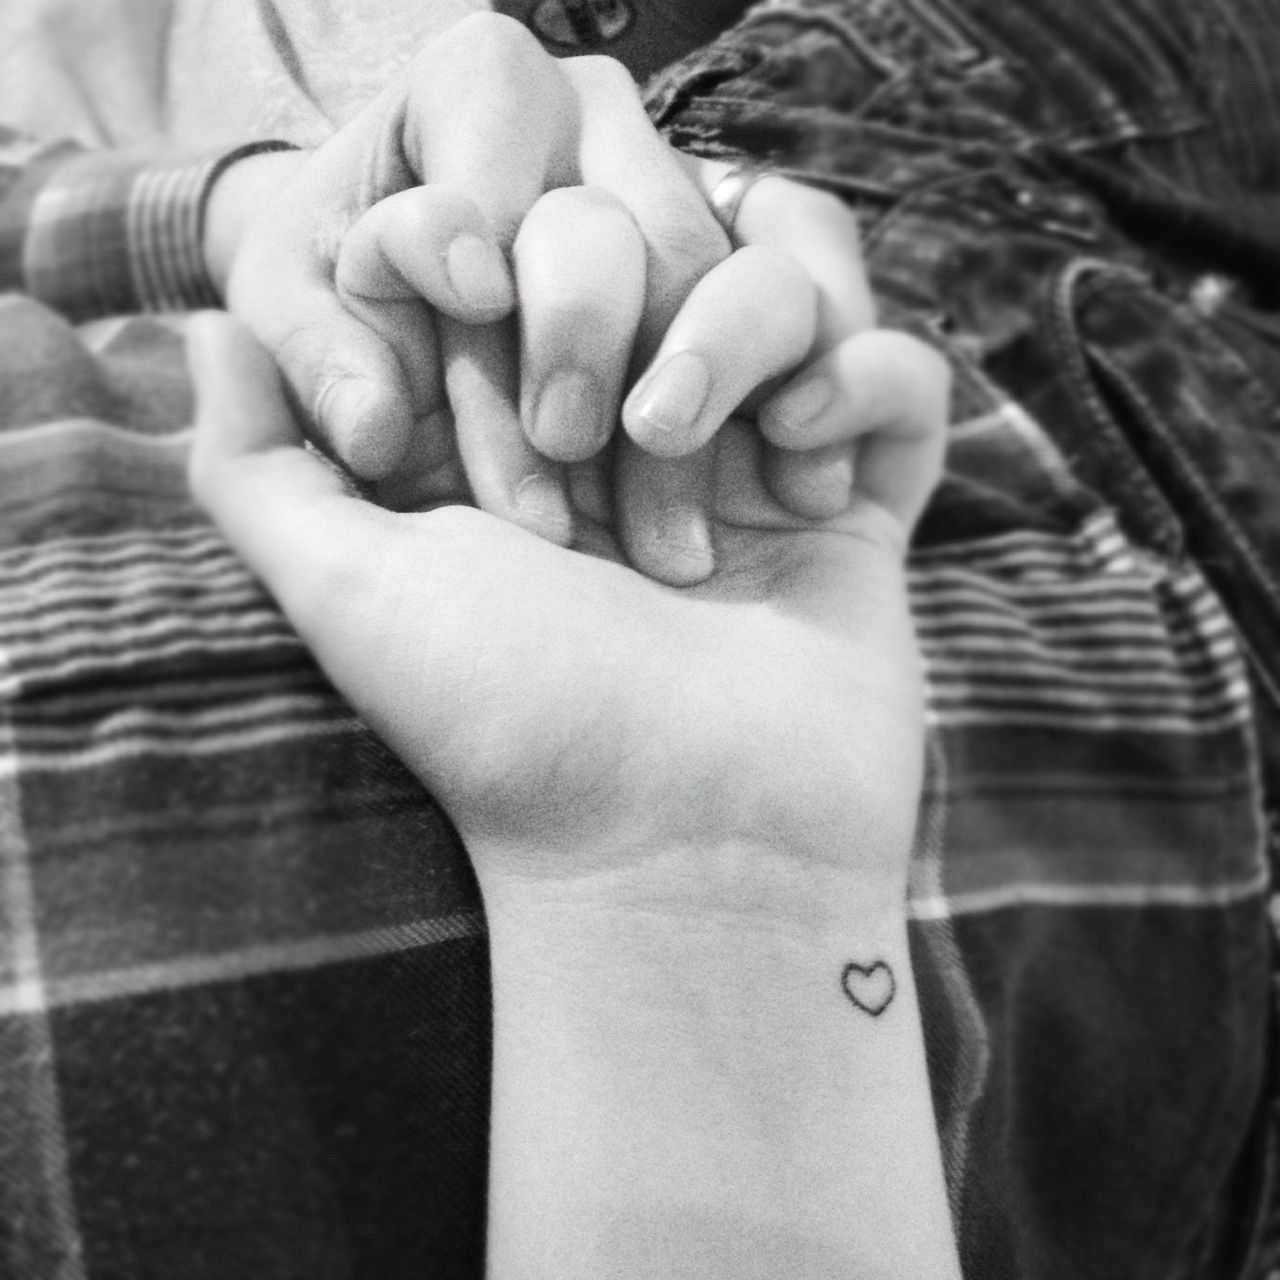 Wrist love tattoo hands